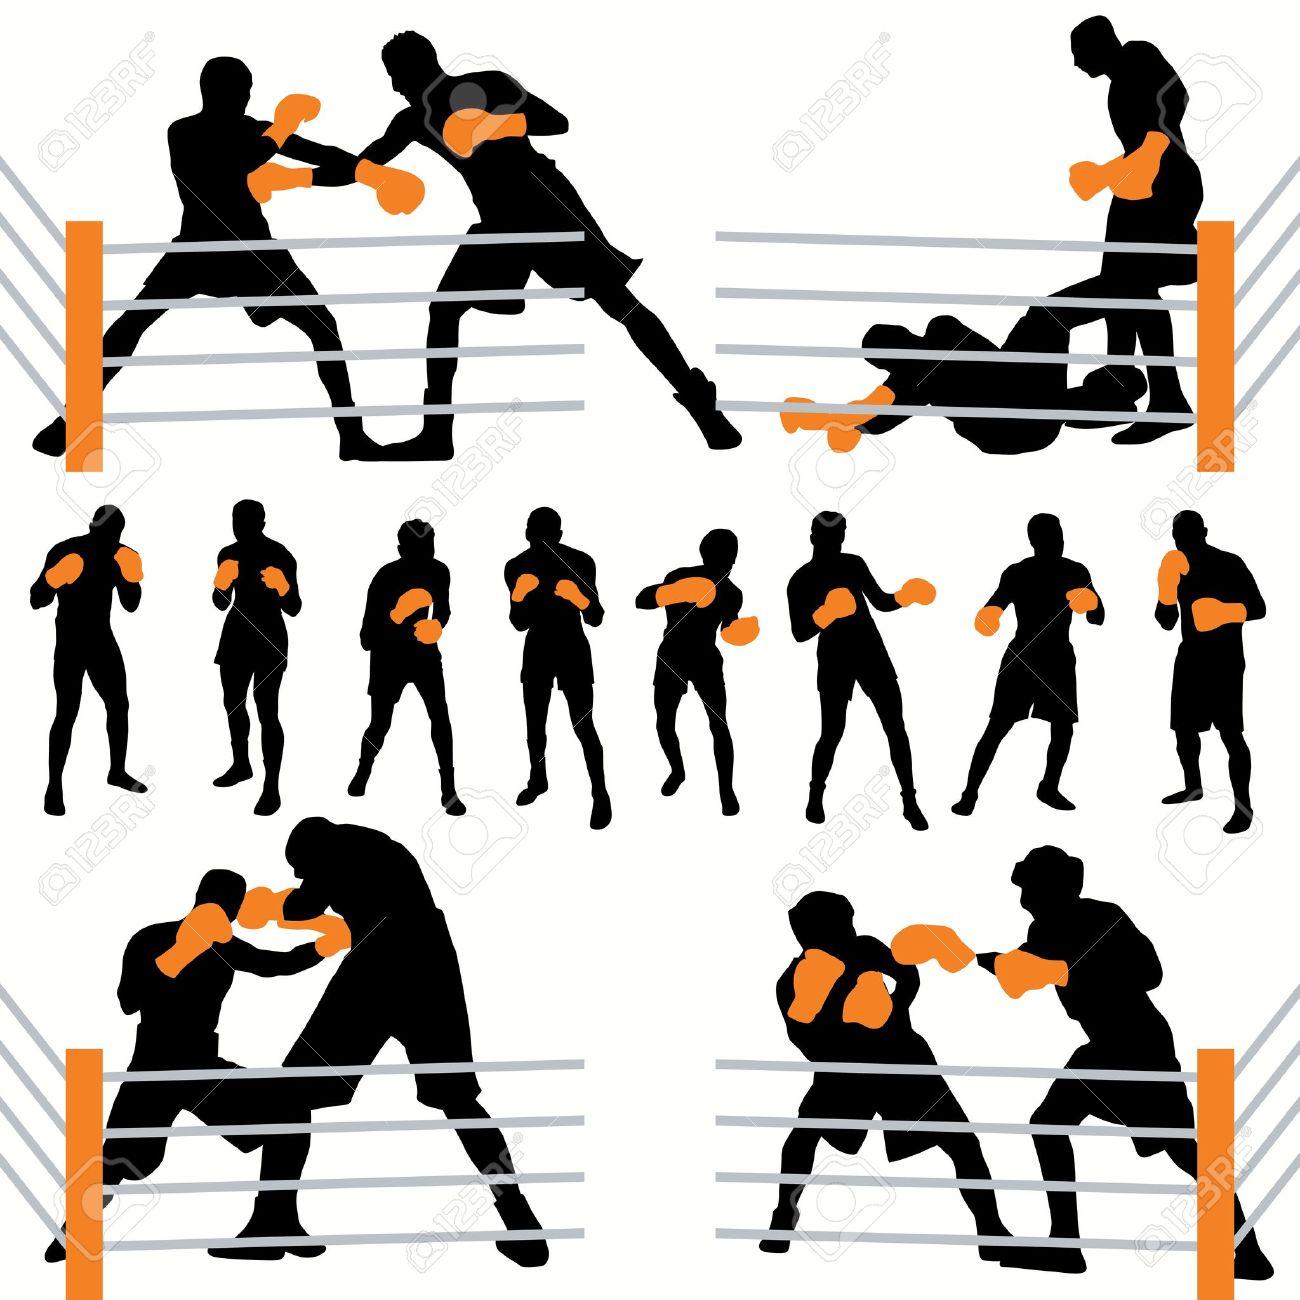 boxer outline clipart #7